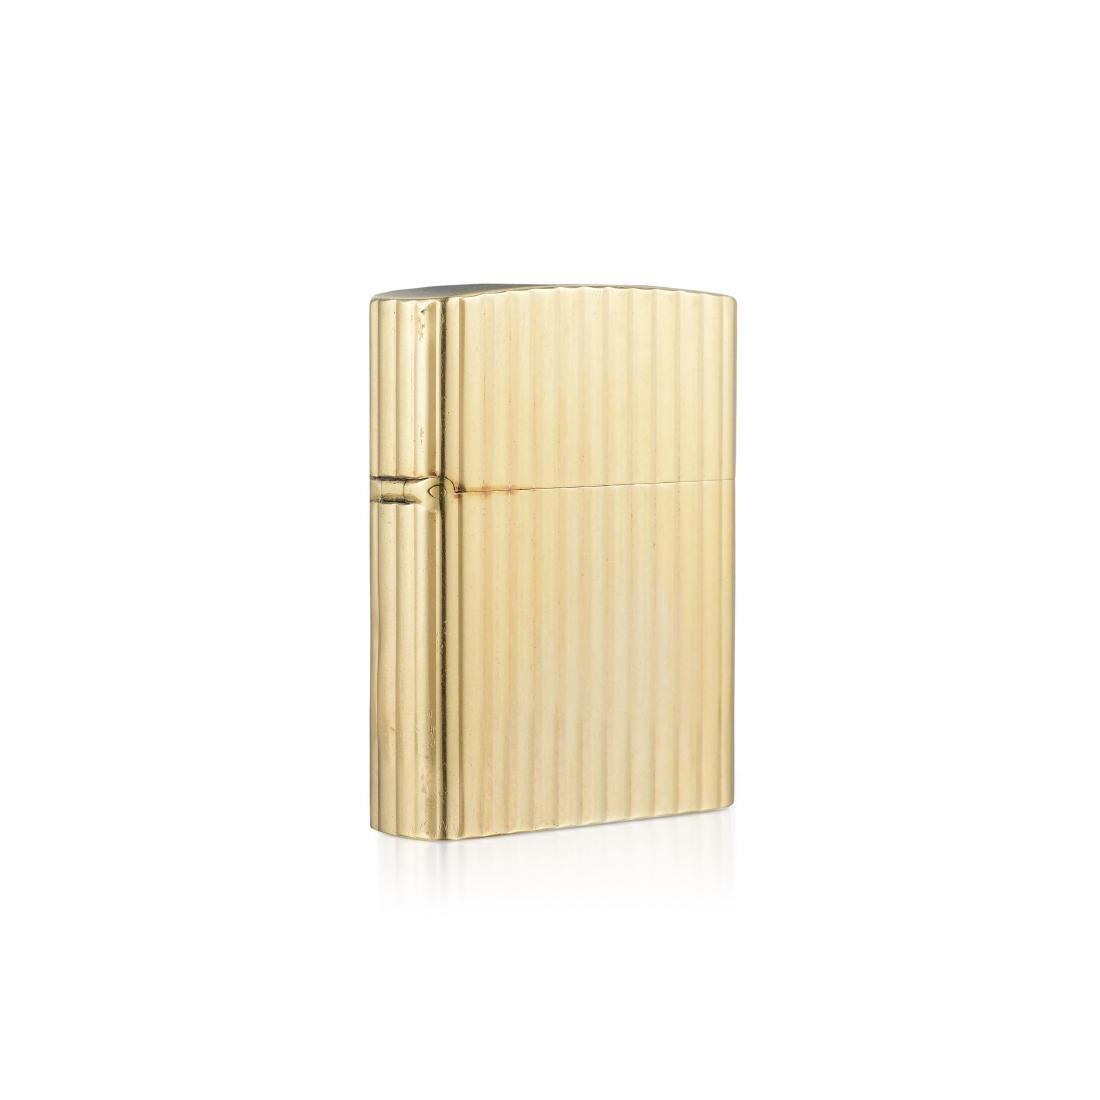 Tiffany & Co. Gold Zippo Lighter